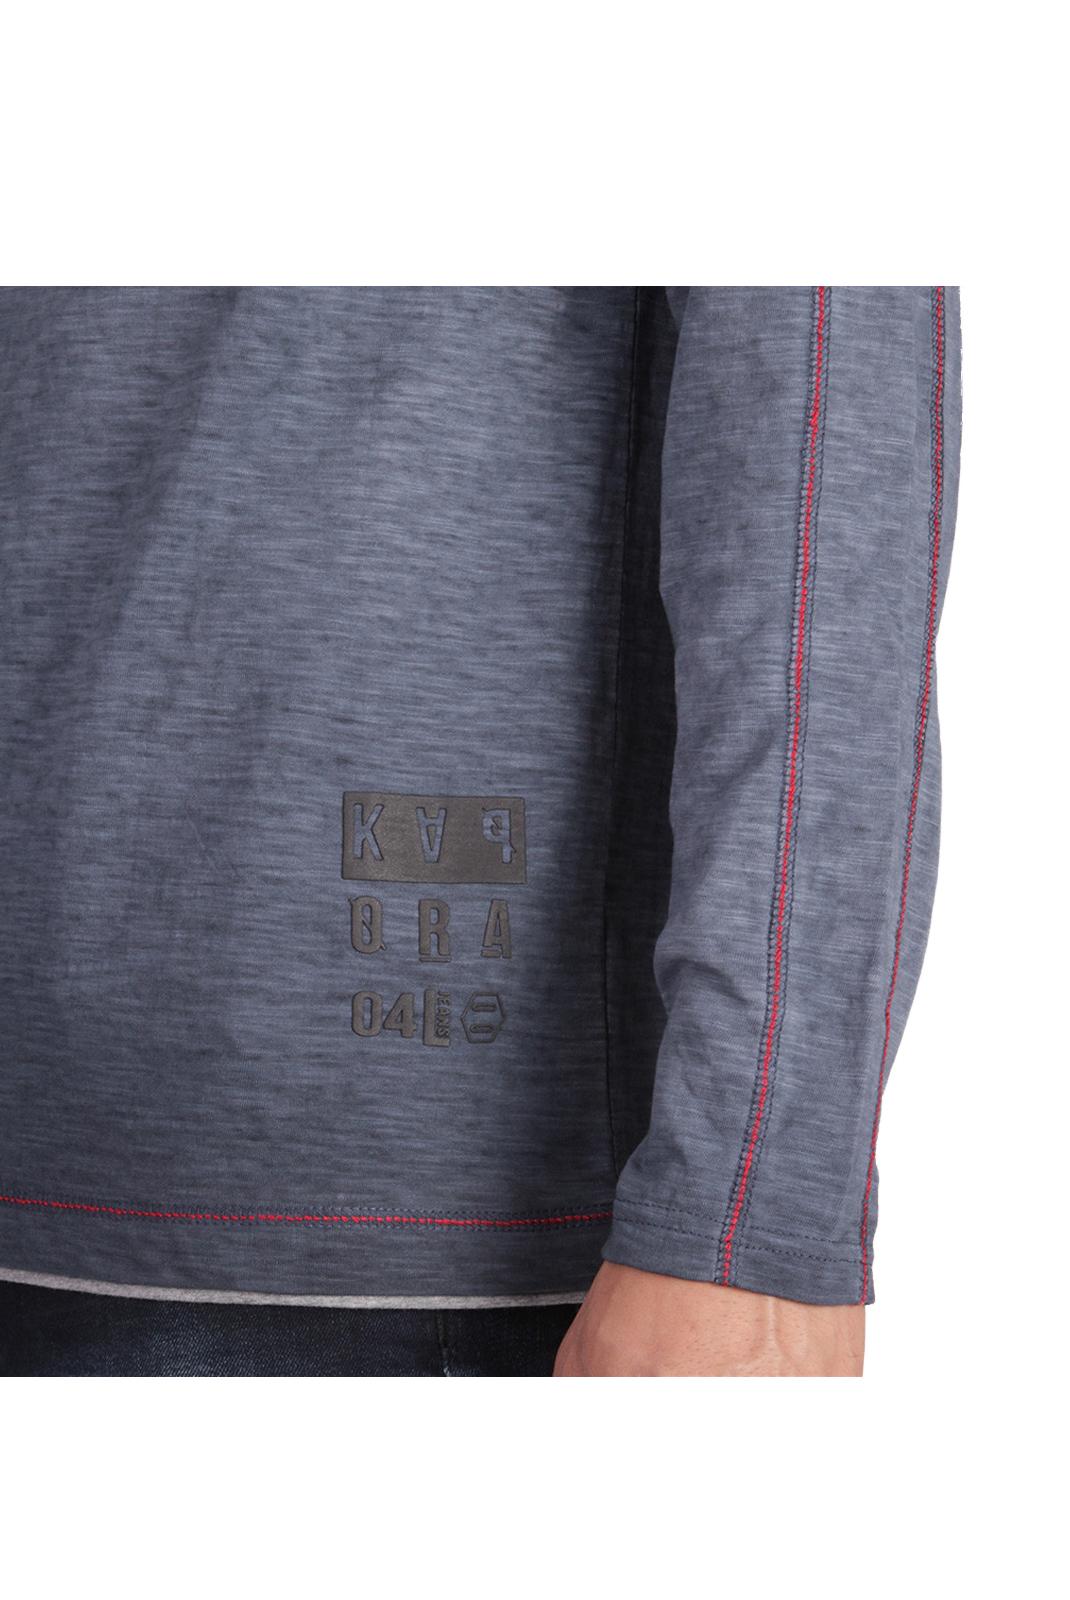 Tee-shirts  Kaporal GODAL NAVY